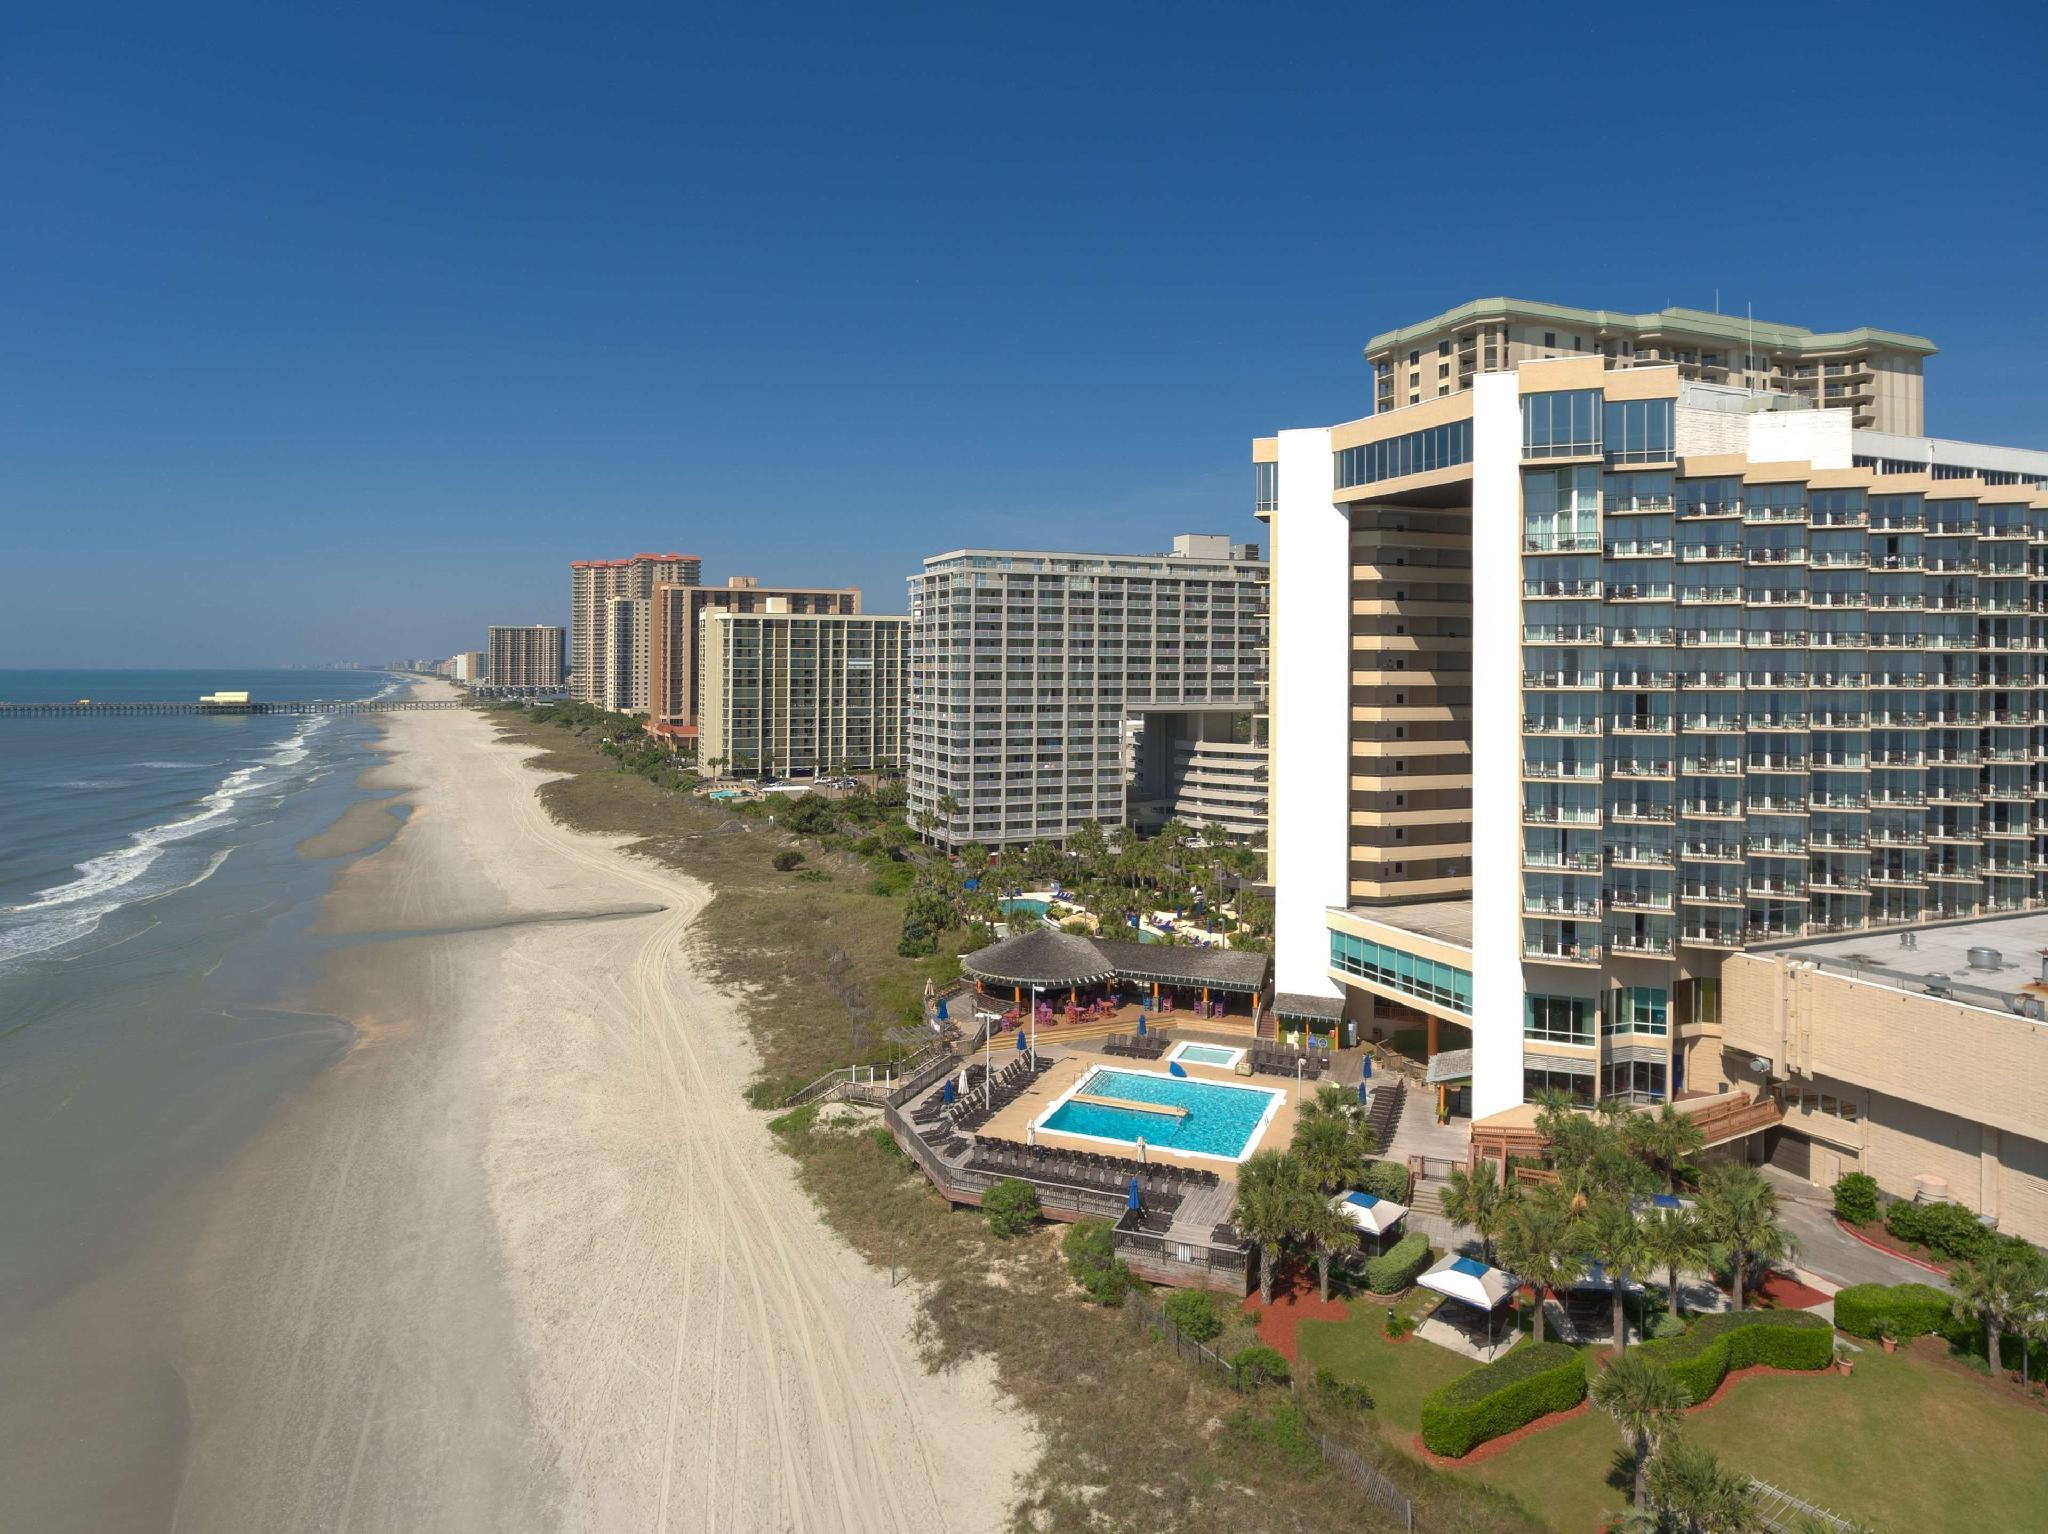 Hilton Myrtle Beach Resort image